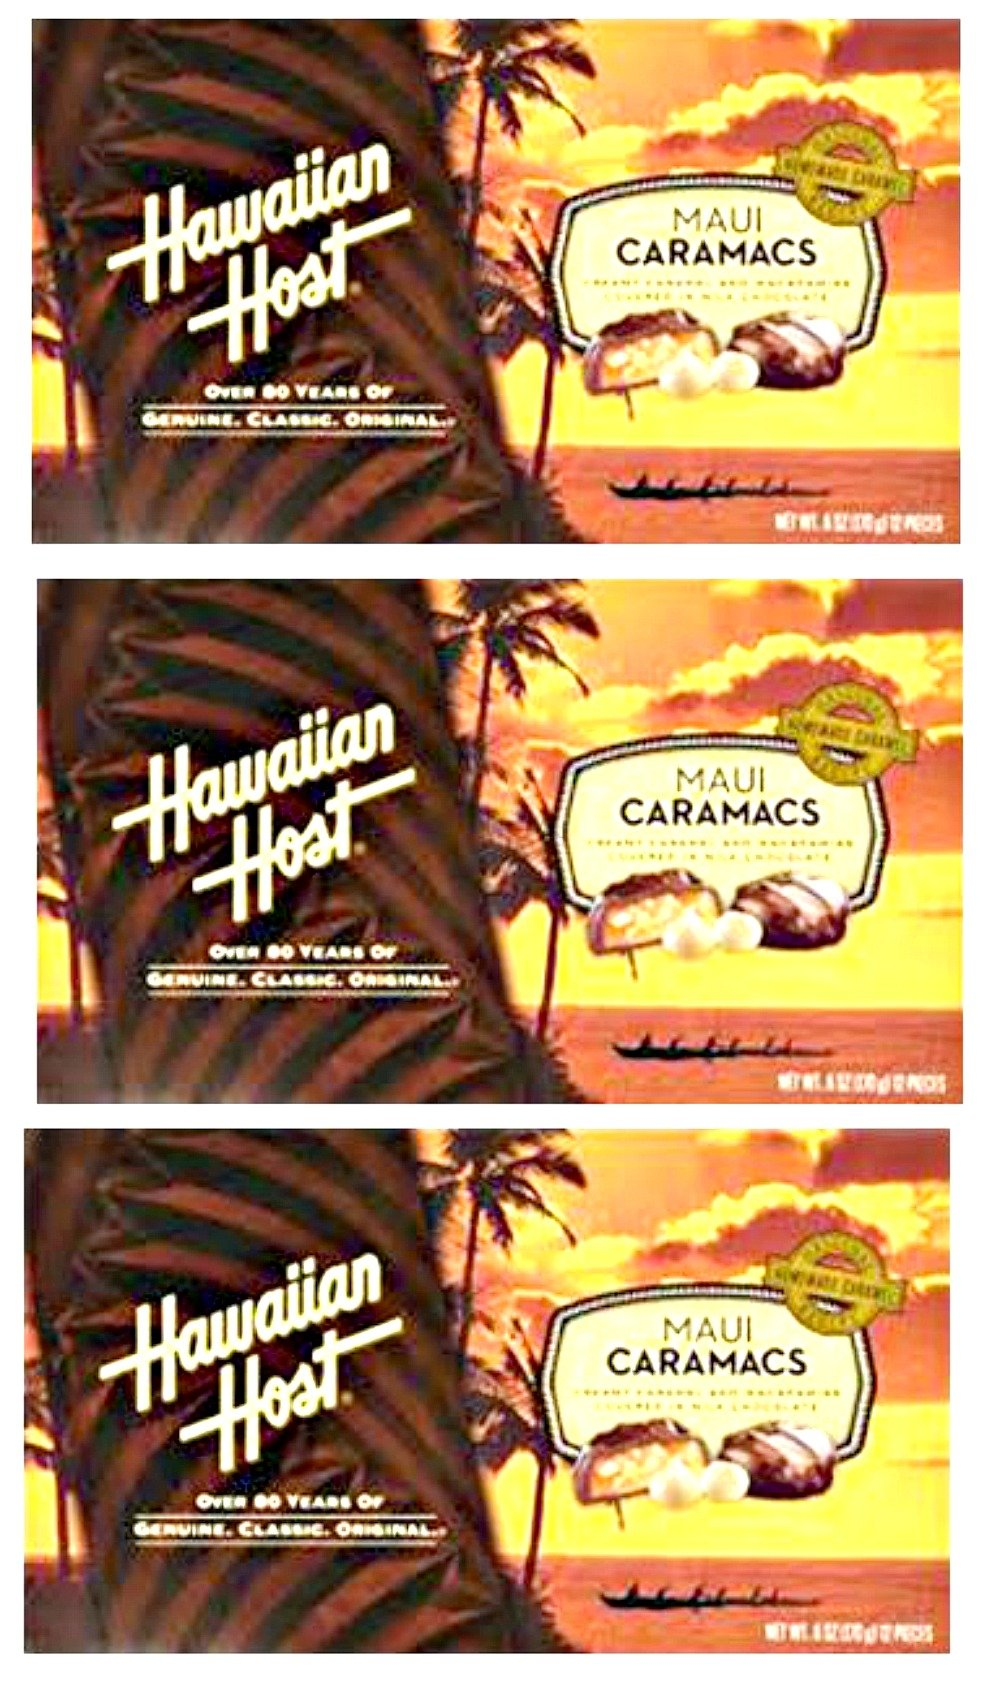 Hawaiian Host Value Pack Macadamia Nuts Maui Caramacs 3 Boxes